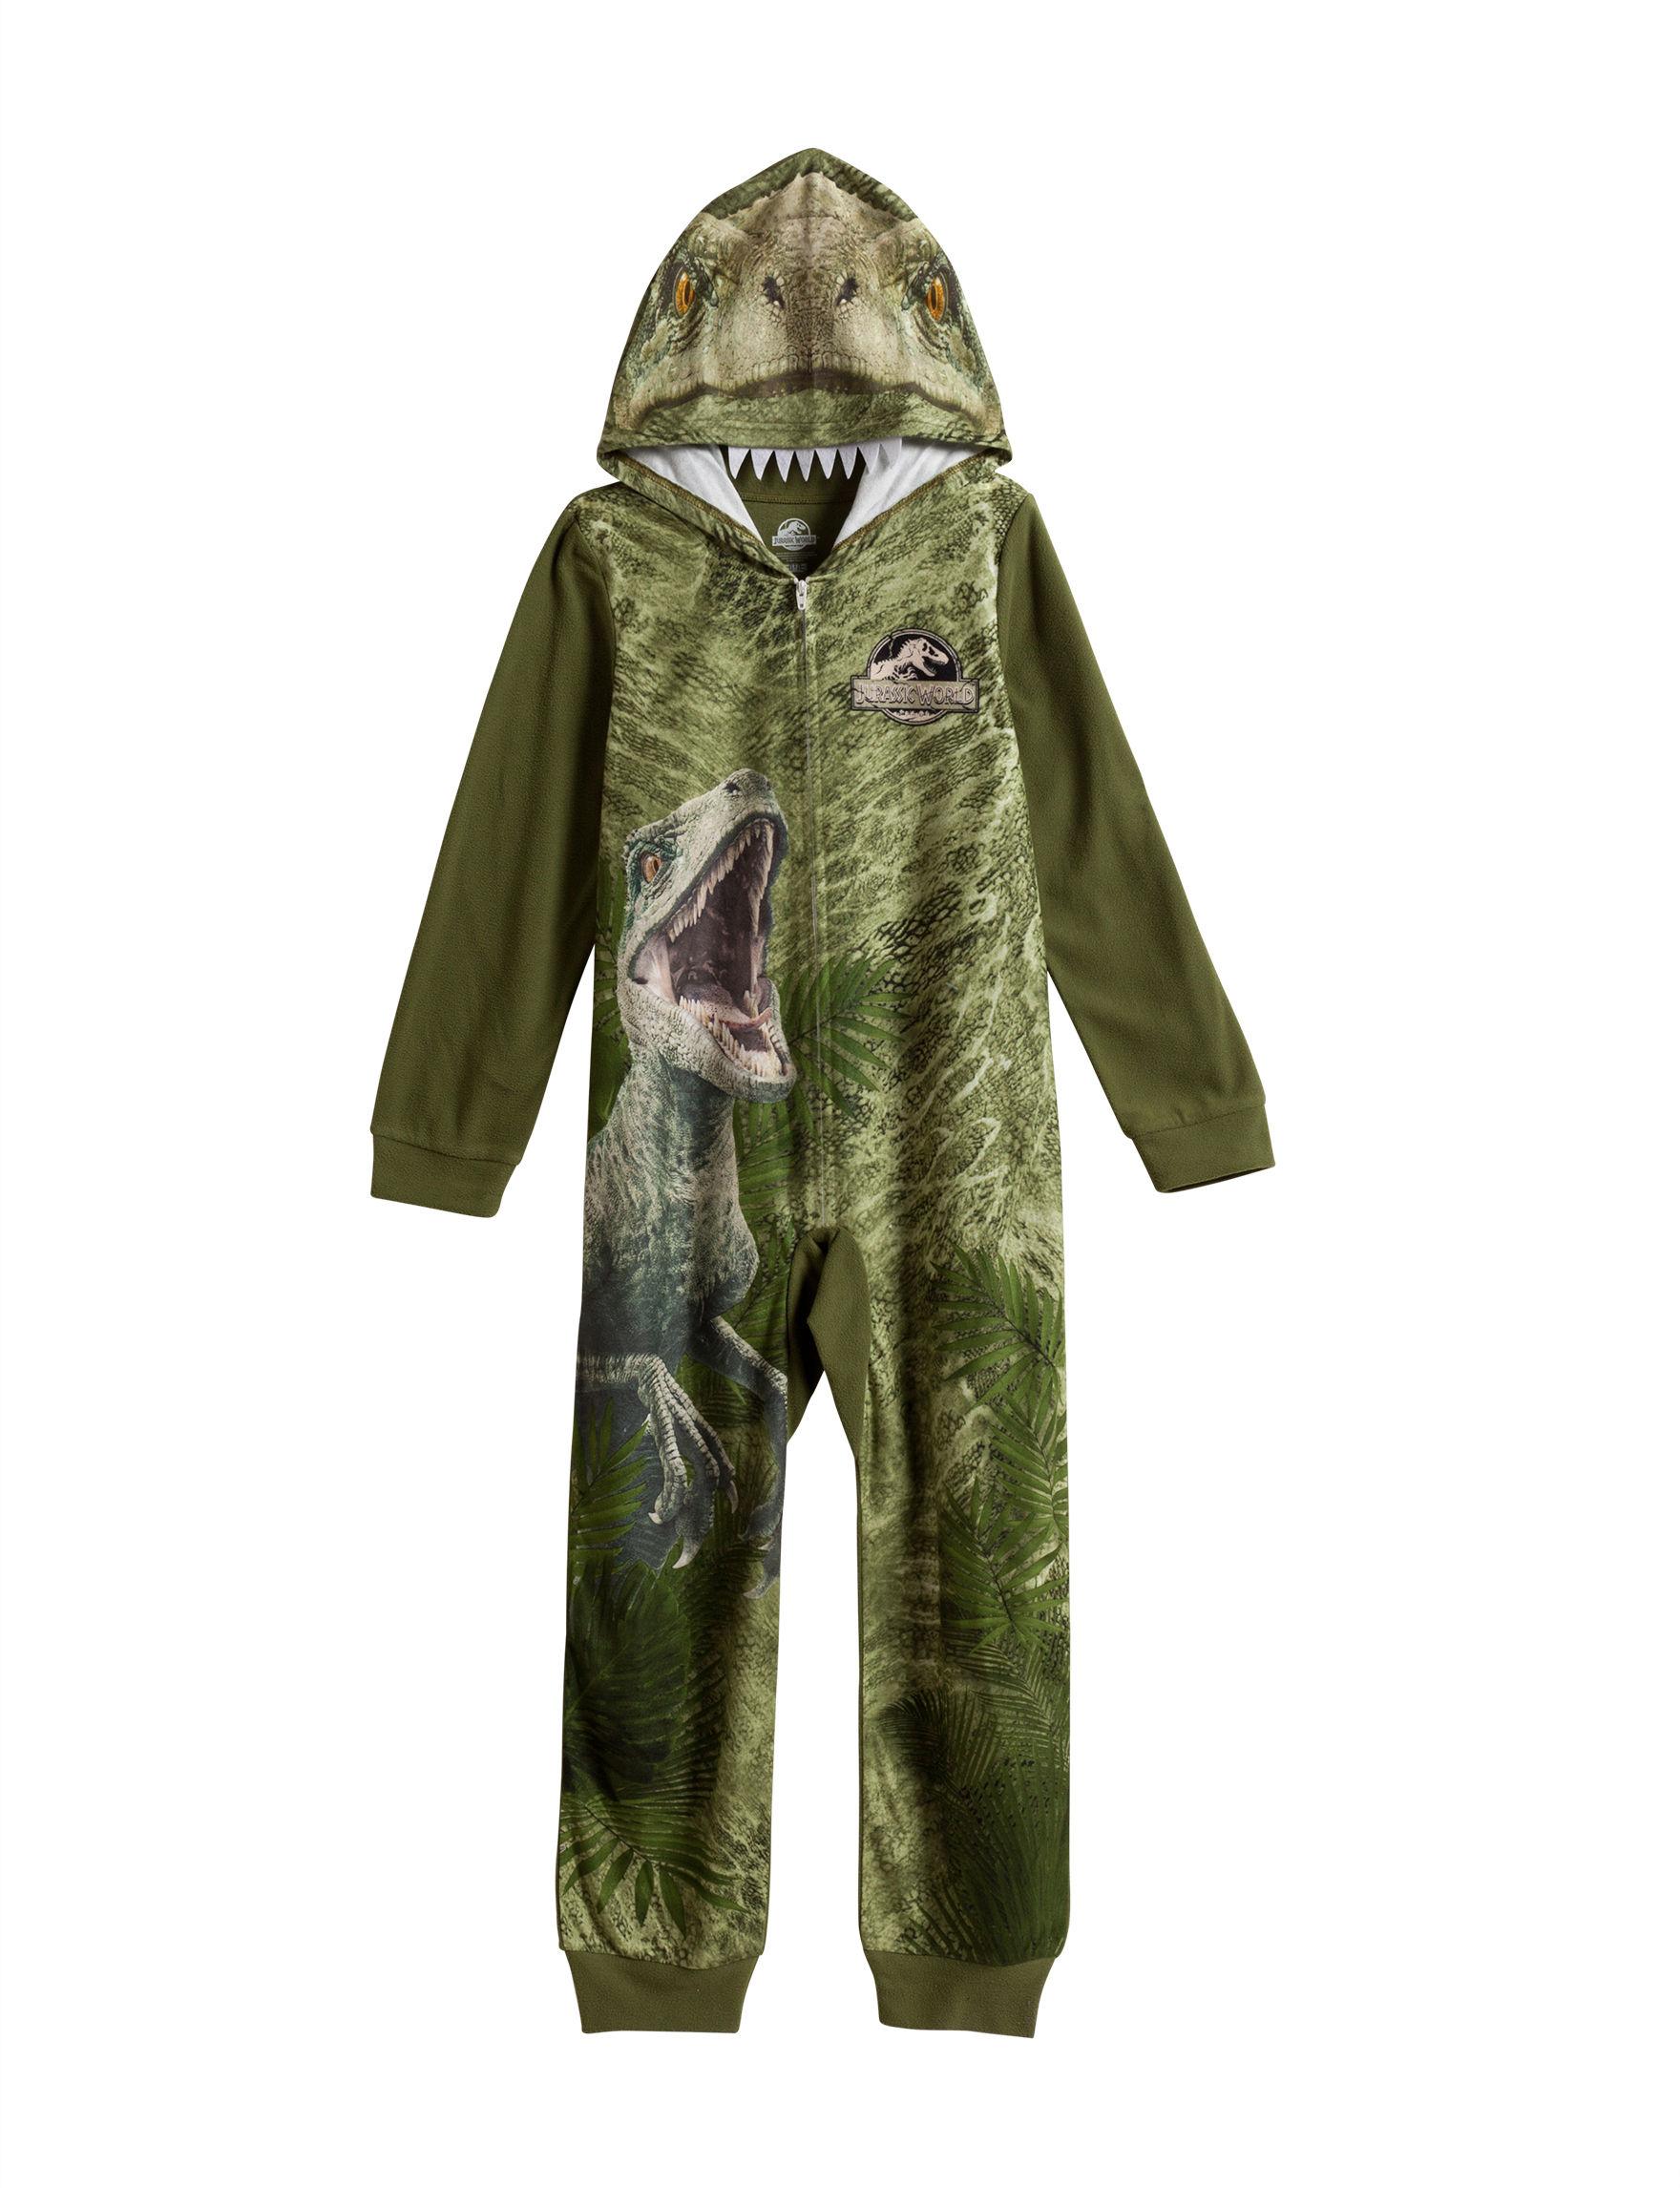 Licensed Green Pajama Sets